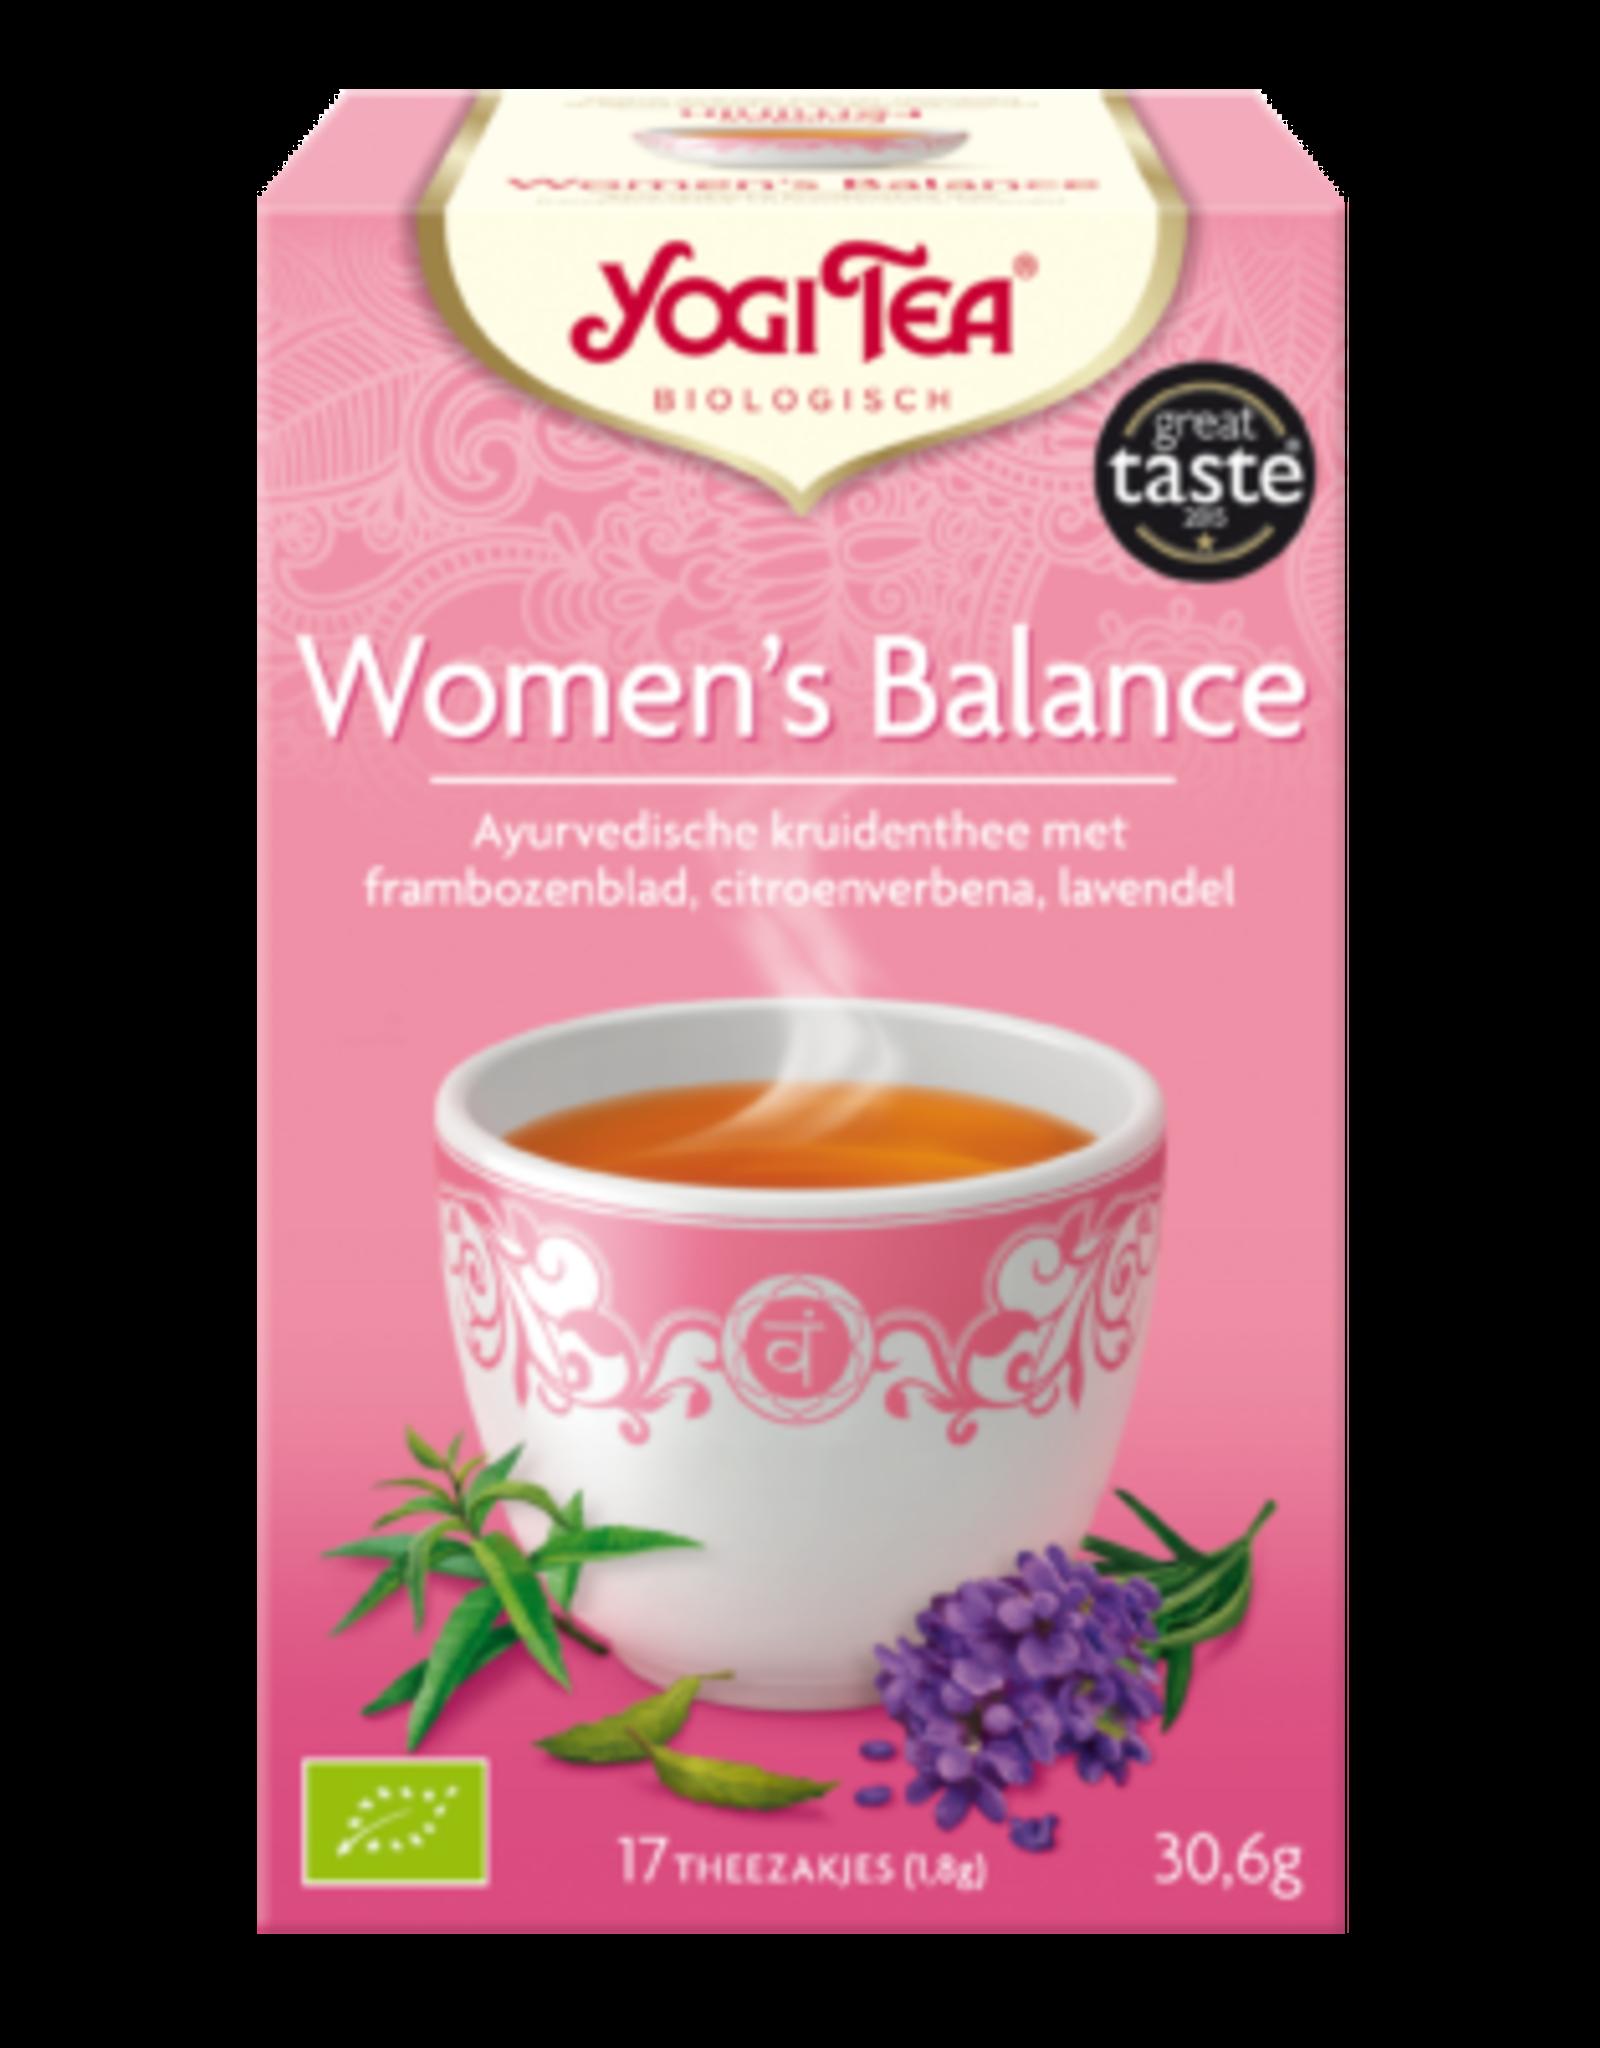 Yogi Tea Yogi Tea Women's balance